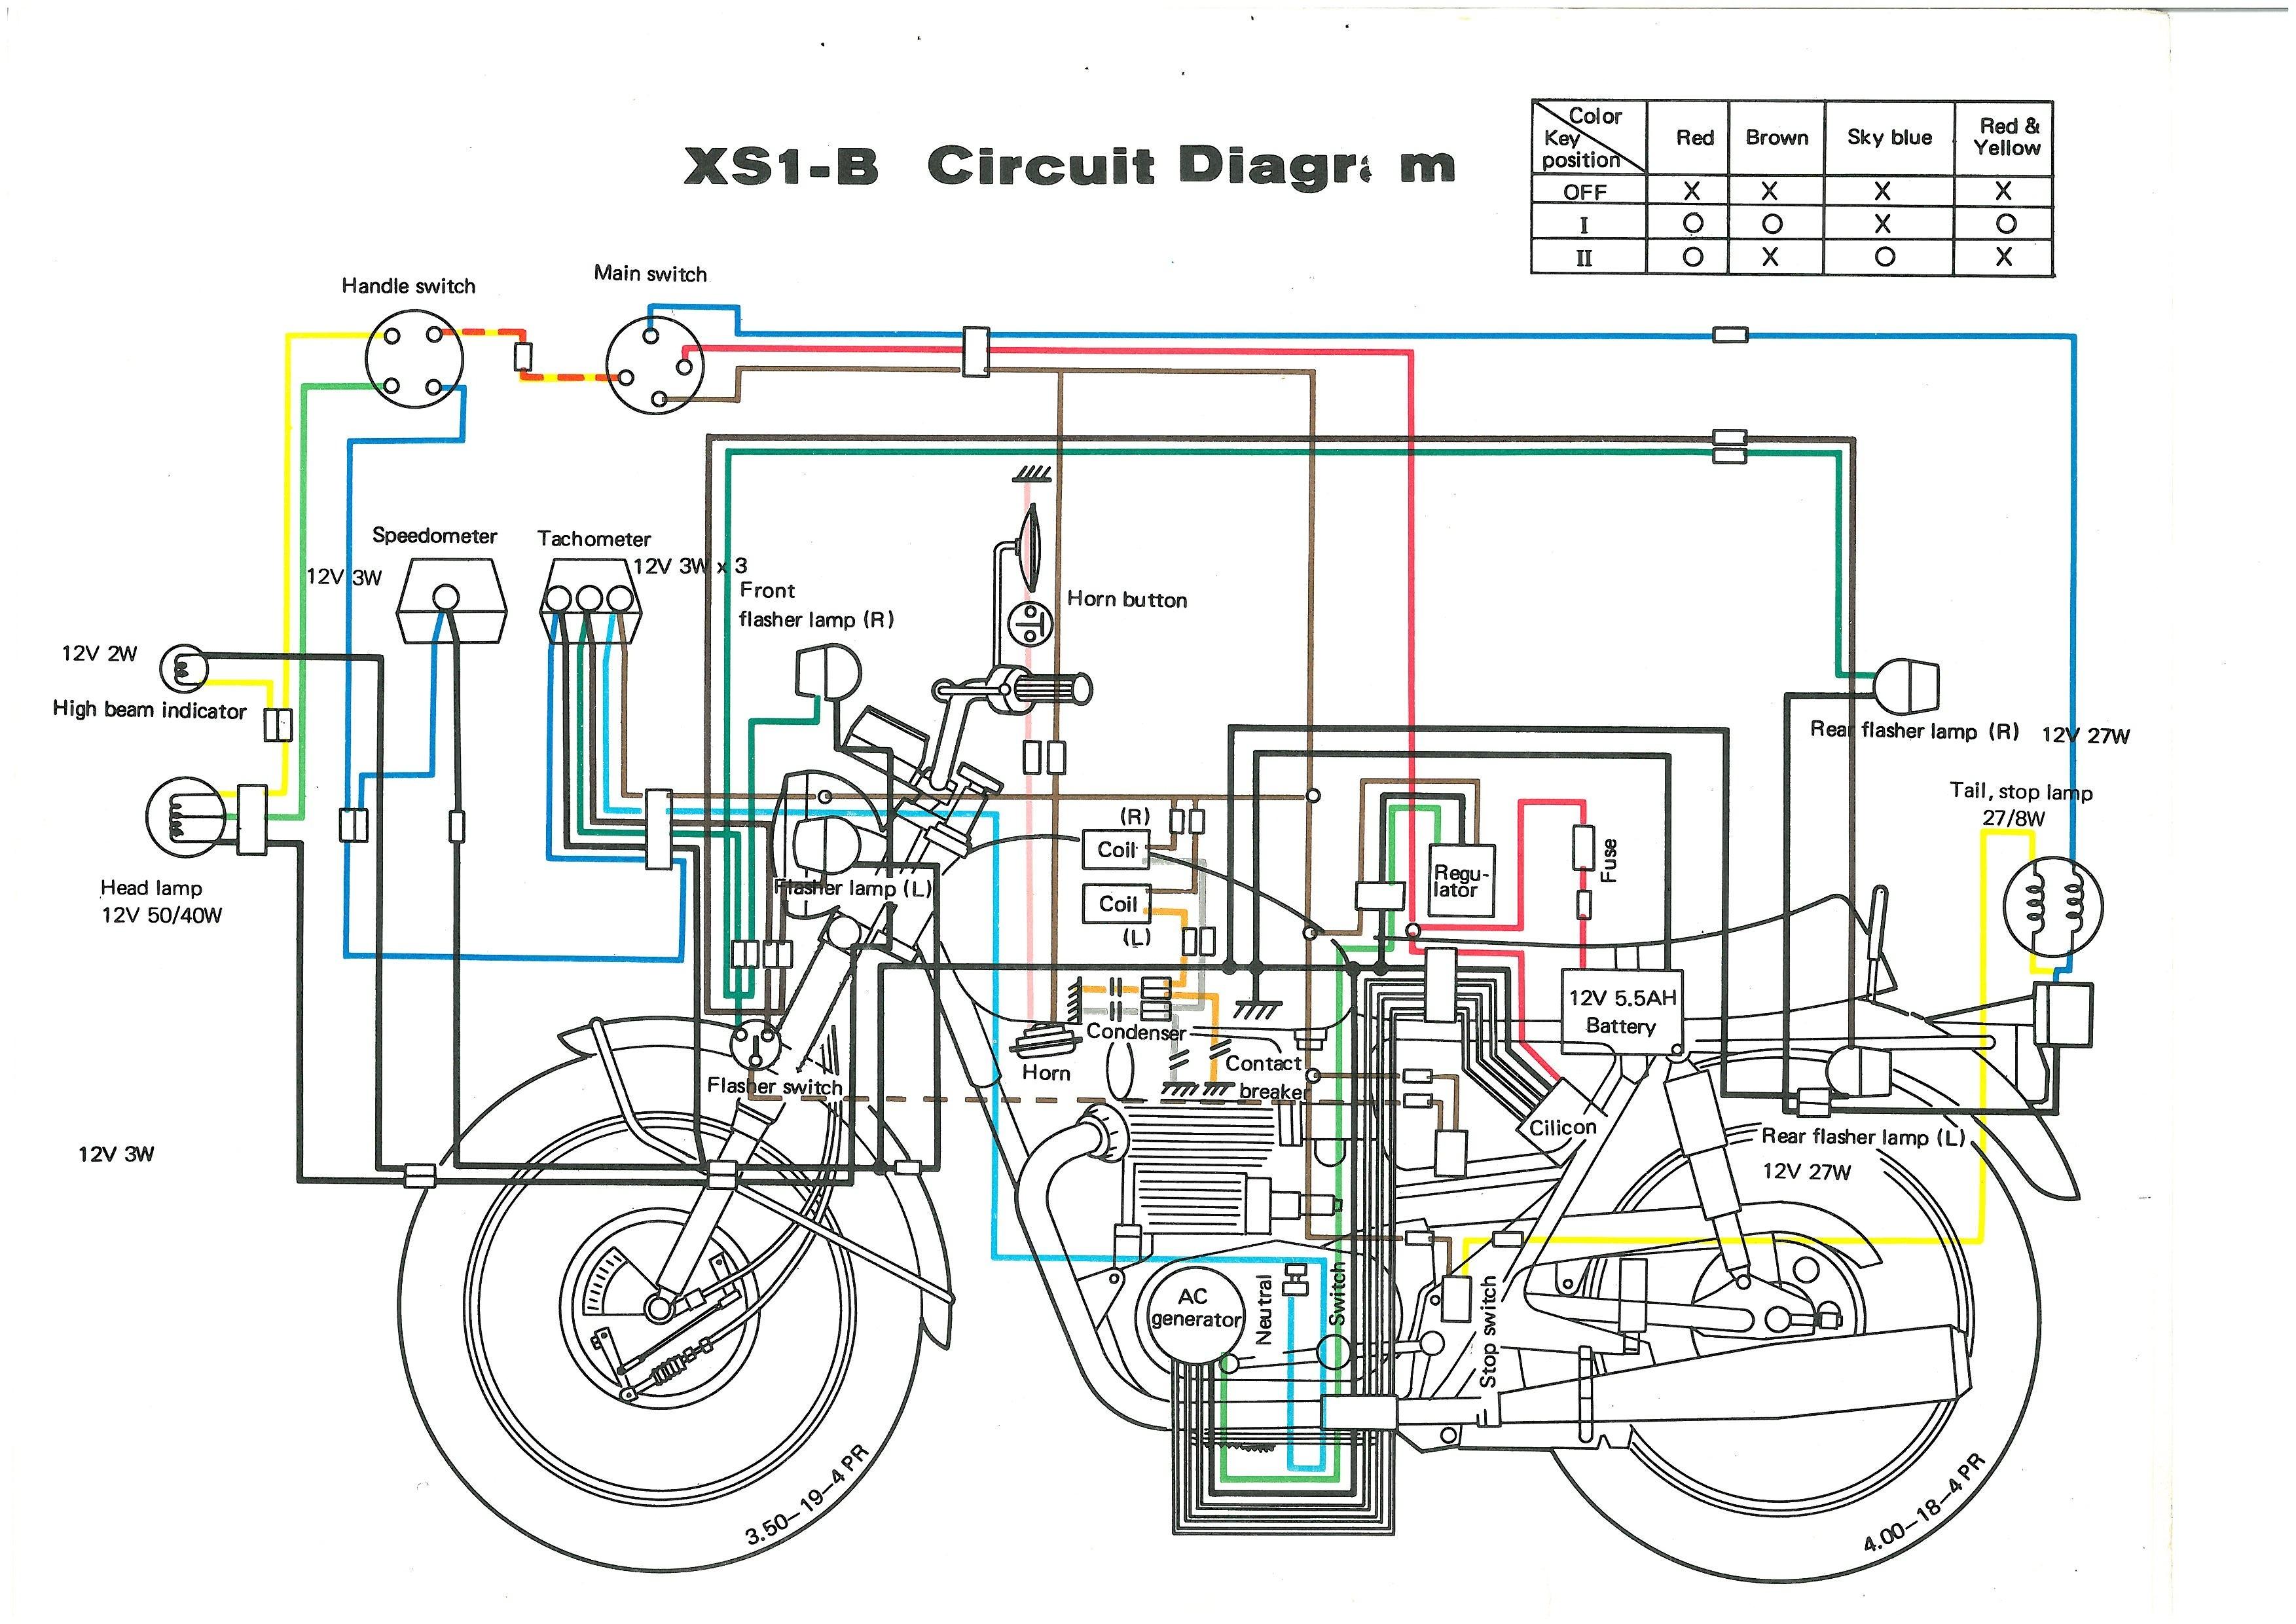 1981 Yamaha Xj650 Wiring Ignition - Car Alarm Wiring Diagram 2000 Camry for Wiring  Diagram Schematics | 1980 Yamaha Xj650 Wiring Diagram |  | Wiring Diagram Schematics